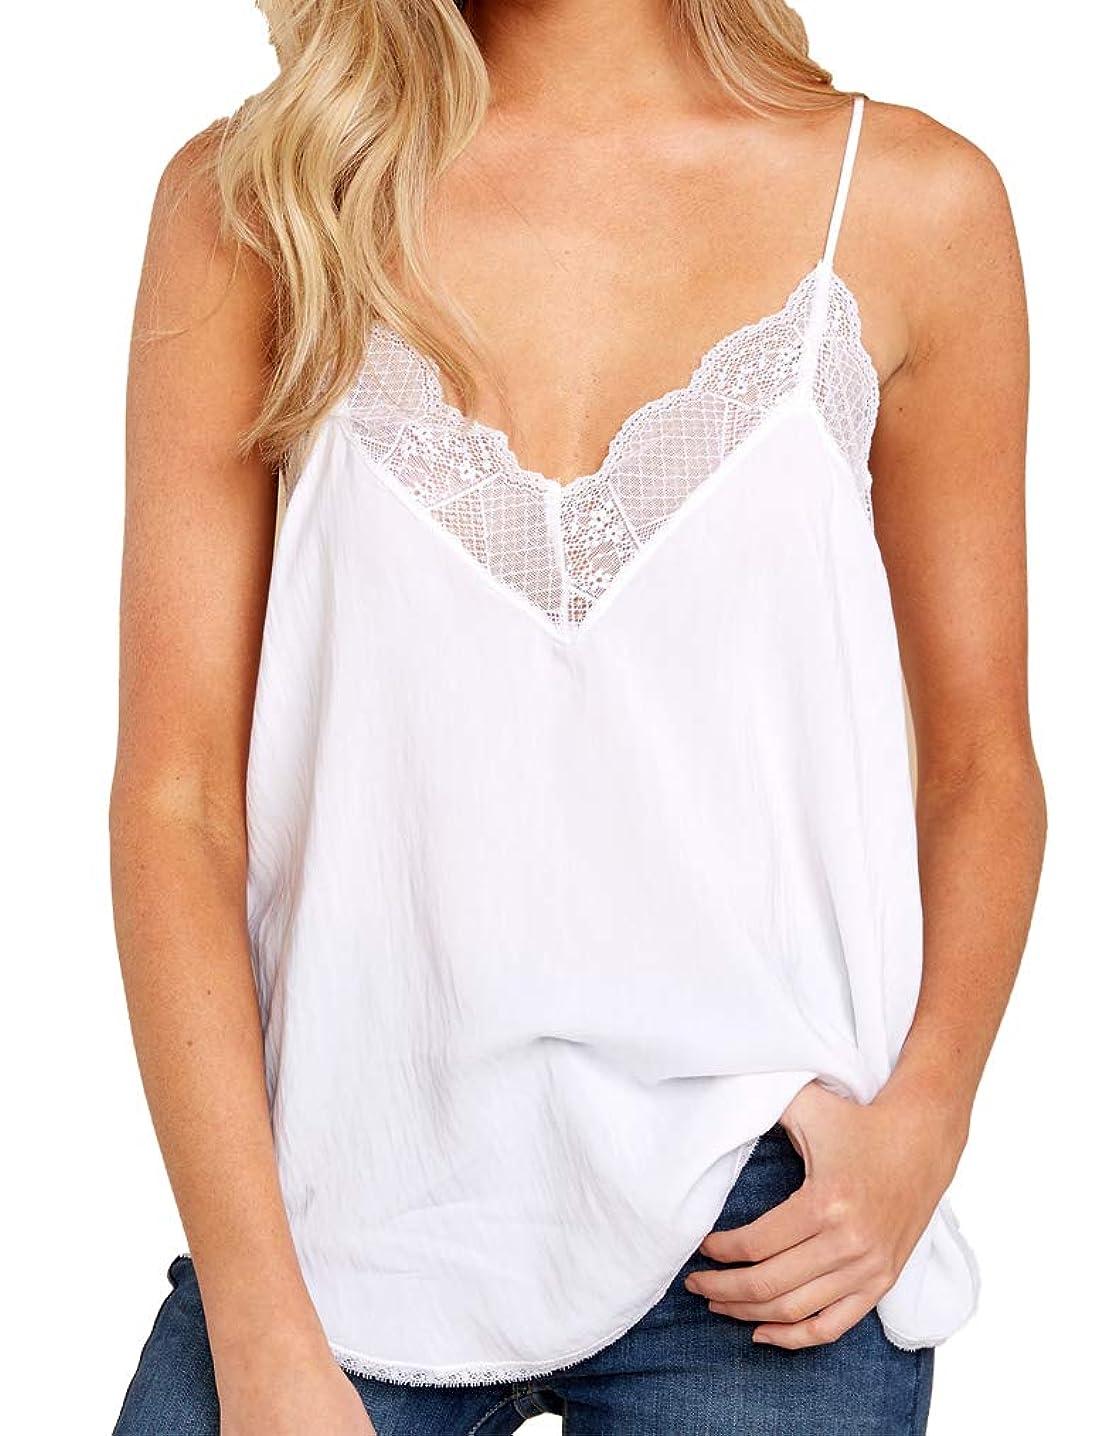 Summer Chiffon Tank Tops for Womens Lace Cami V Neck Spaghetti Strap Sexy Camis Sleeveless T-Shirt